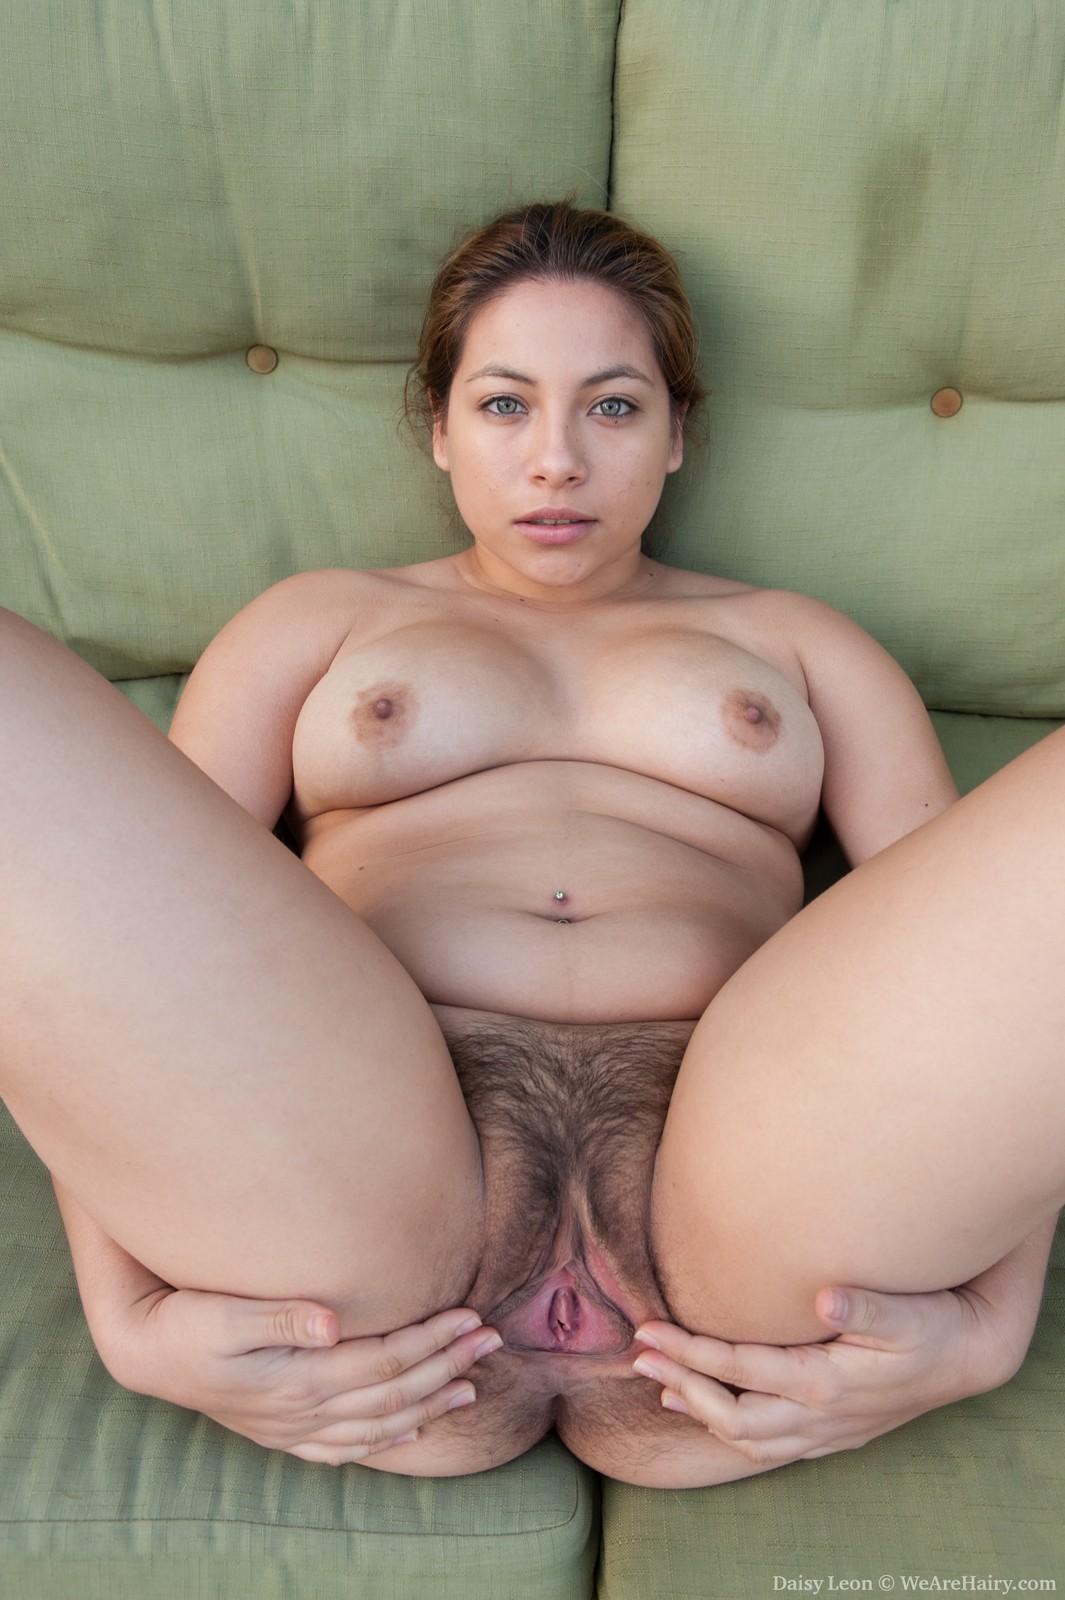 Chubby pic nude hairy